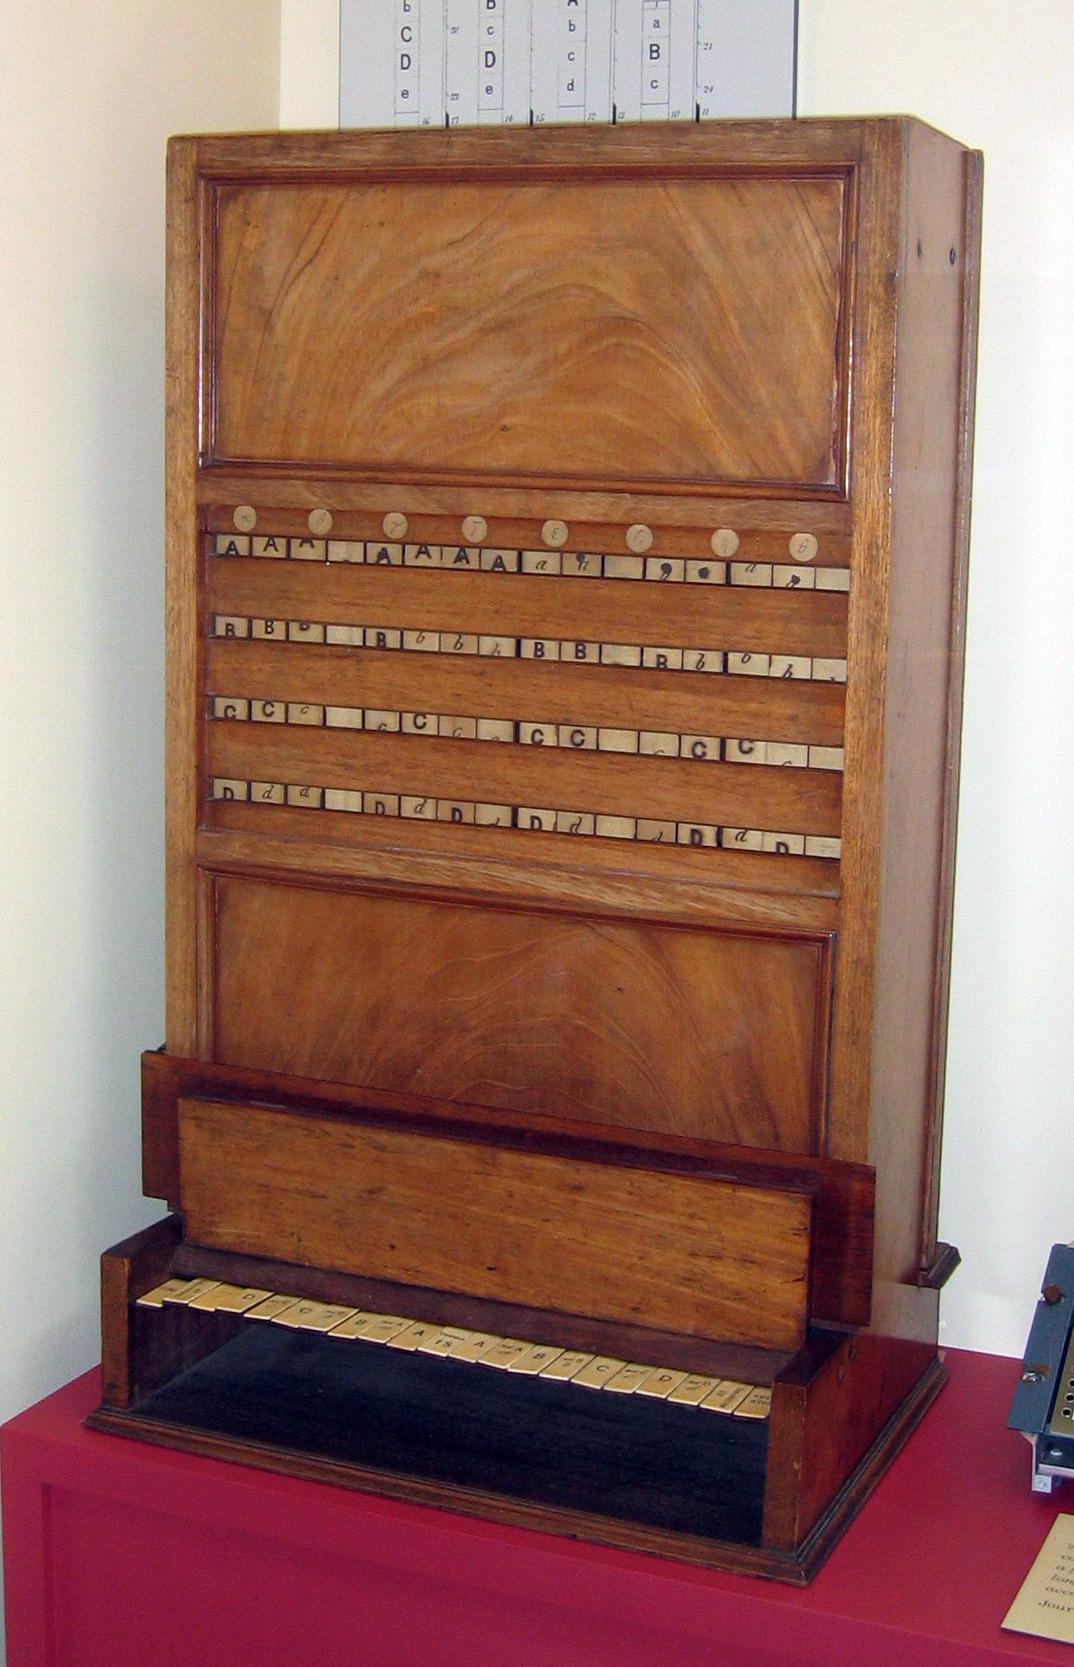 william stanley jevons logic piano.jpg